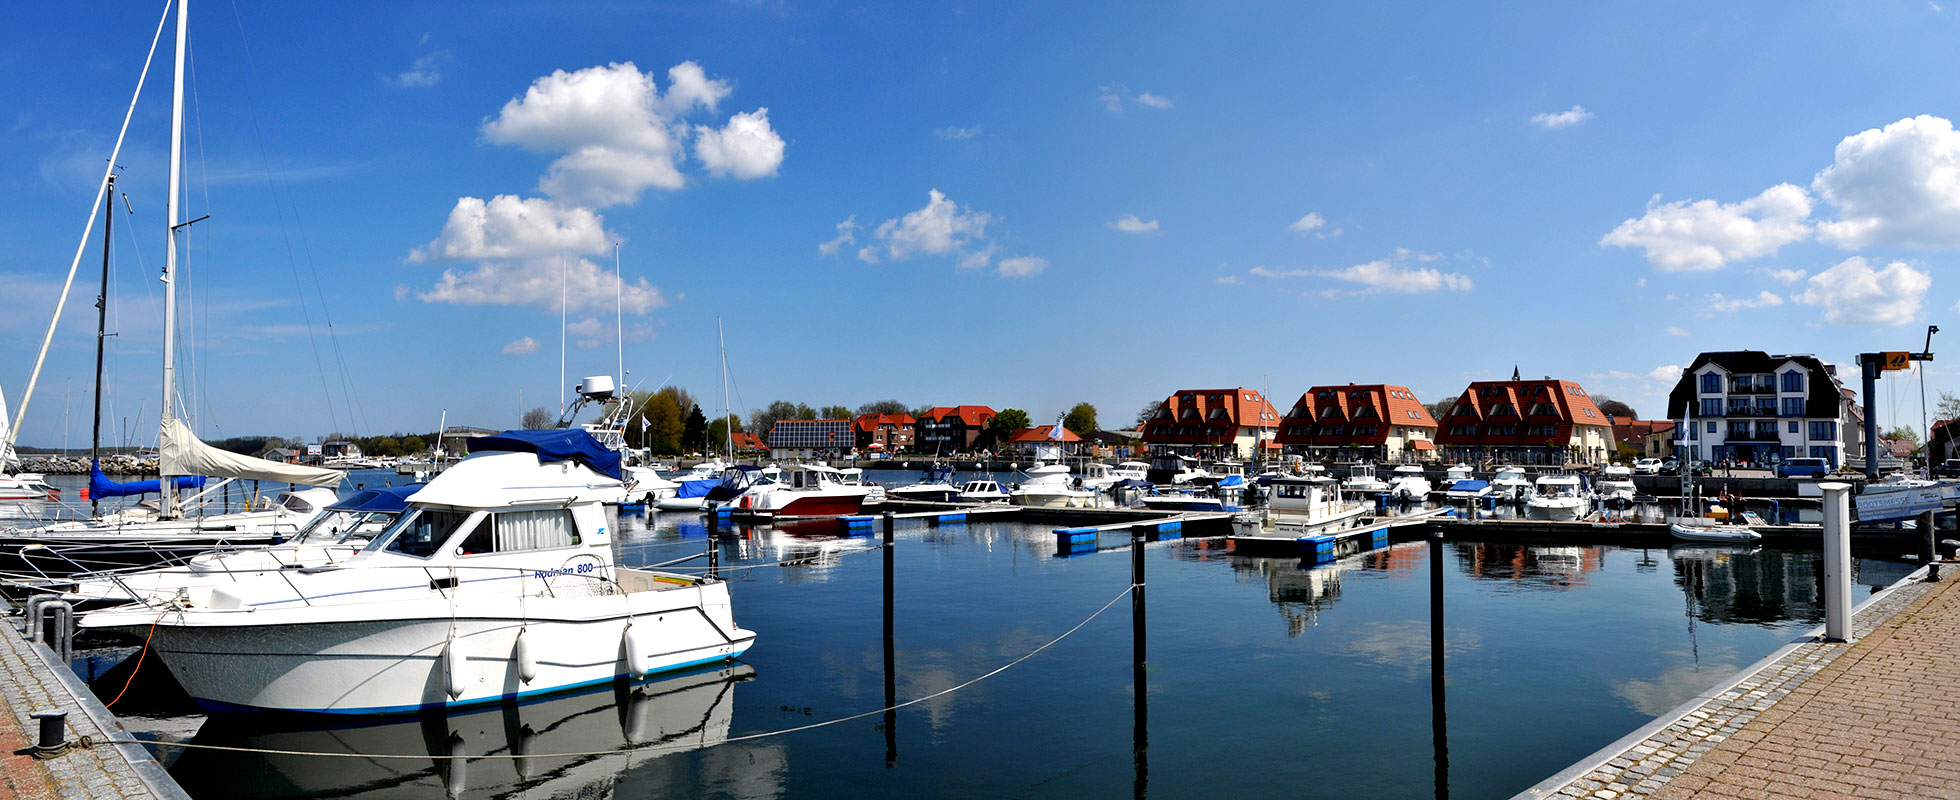 Fotos: Marina Yachthafen Wiek